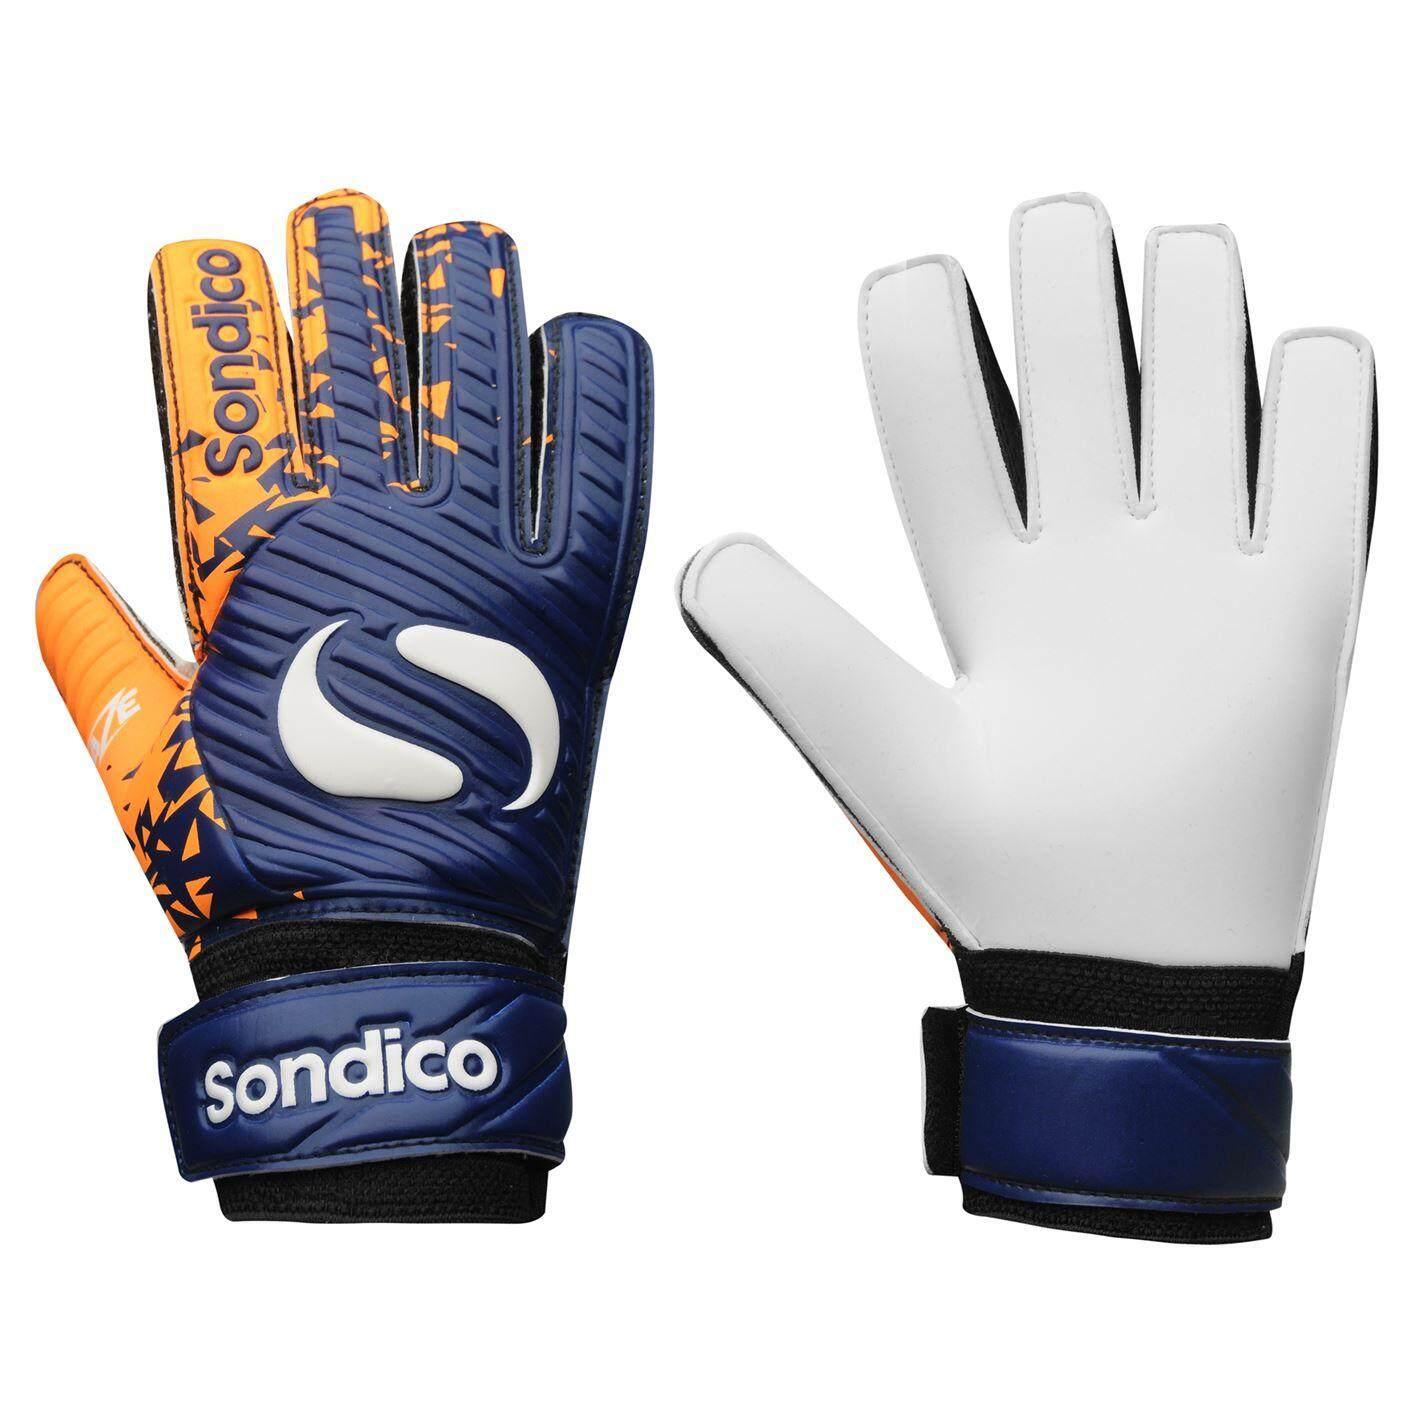 Sondico Kids Blaze Goalkeeper Gloves Navy Orange